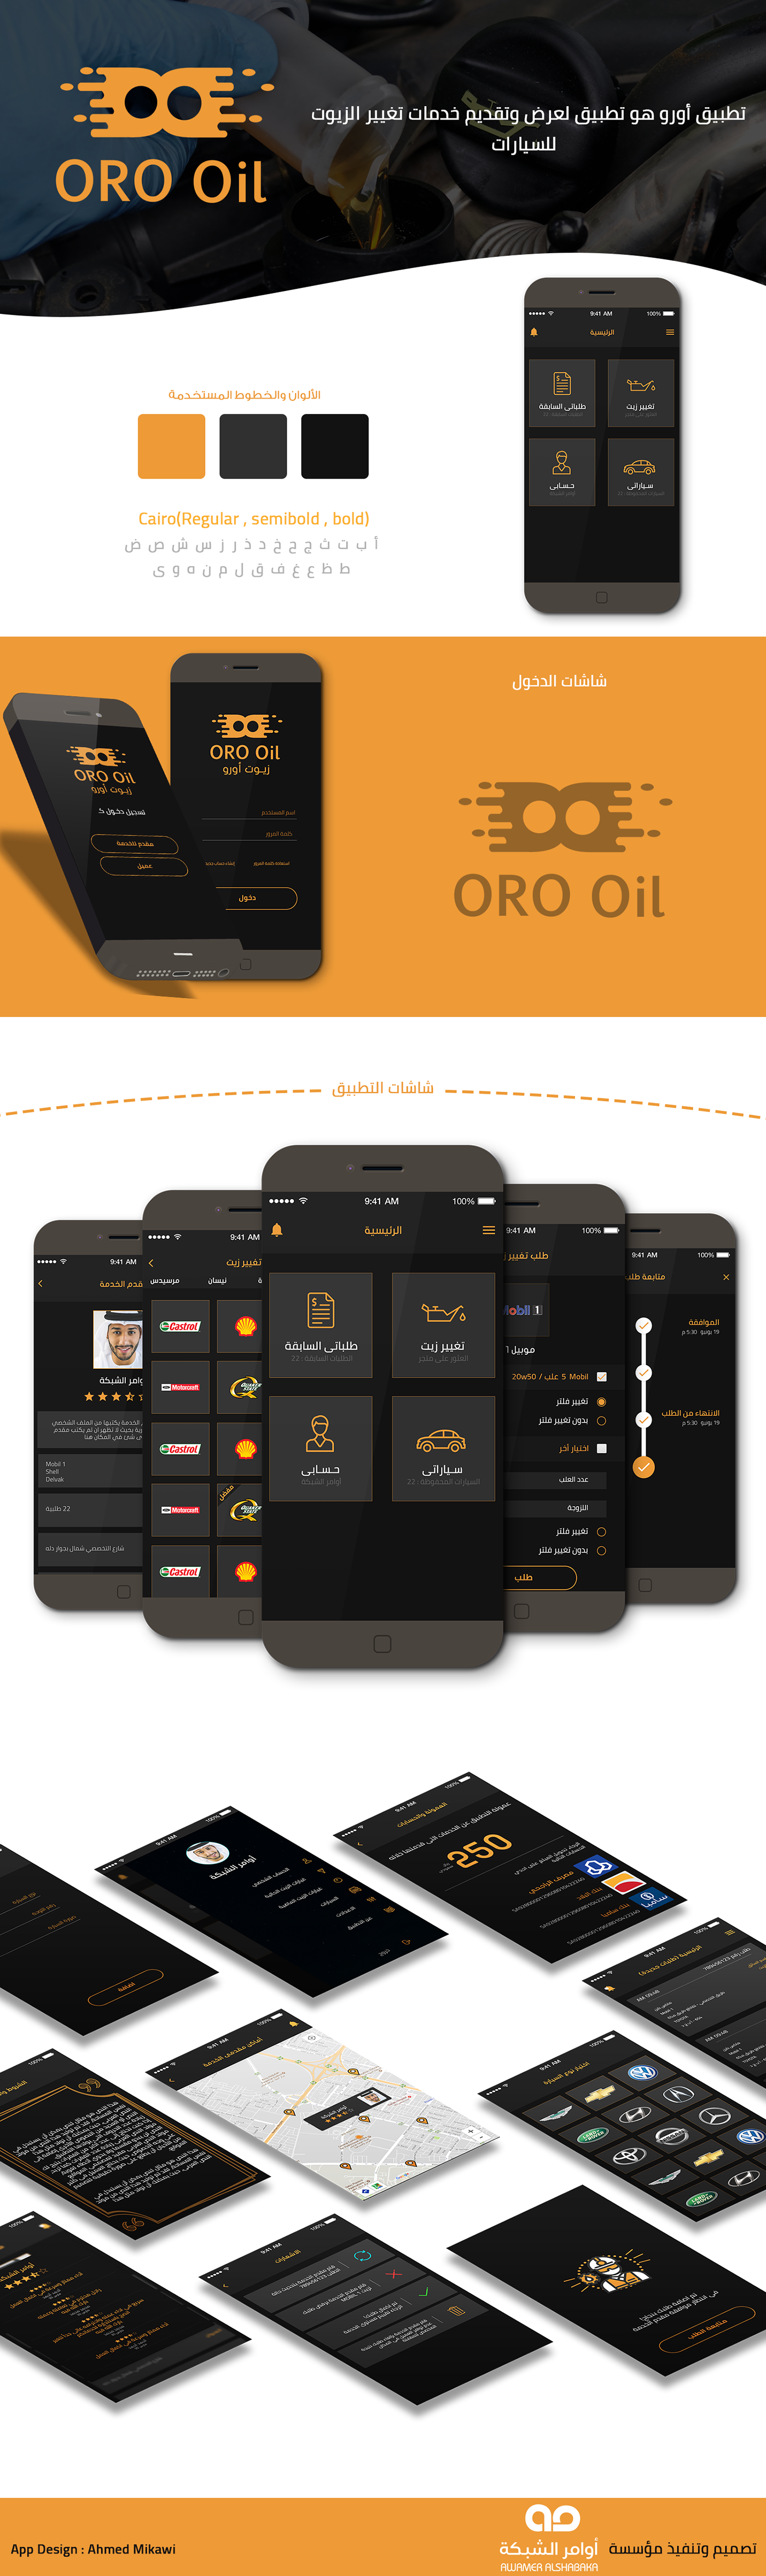 UI ux mobile app Mobile app car